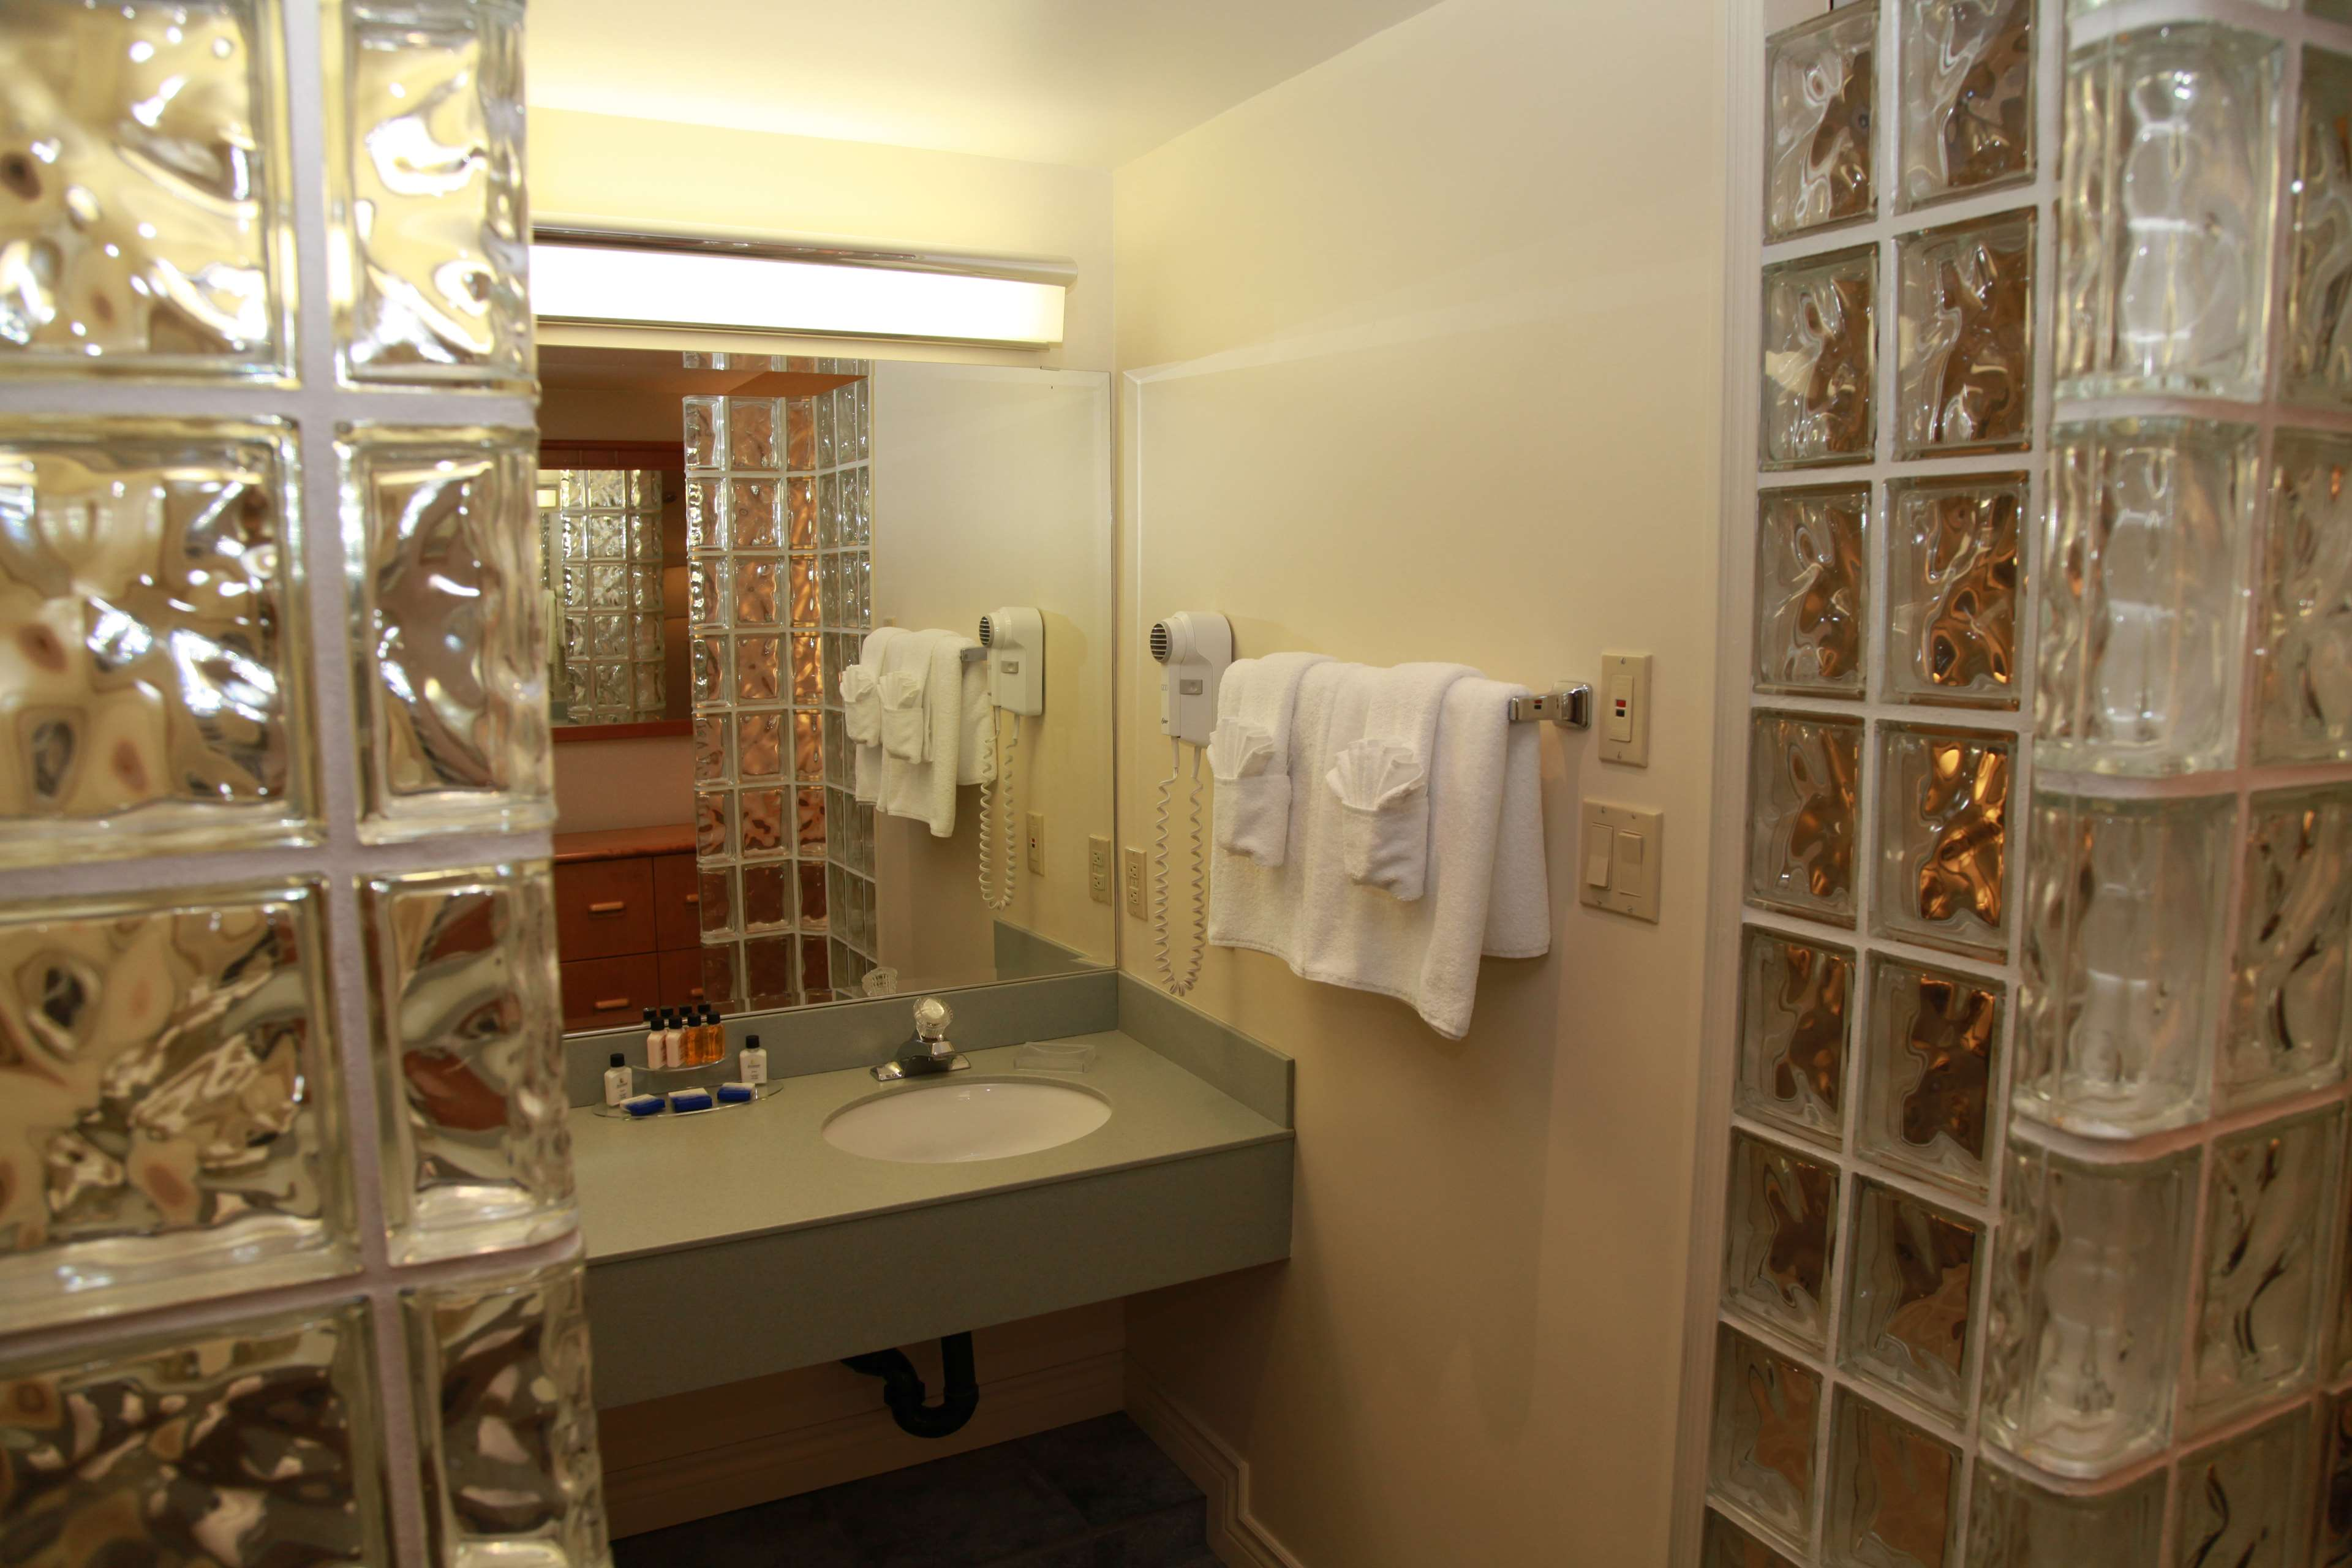 Best Western Plus Barclay Hotel in Port Alberni: Fully Equipped Honeymoon Suite Bathroom